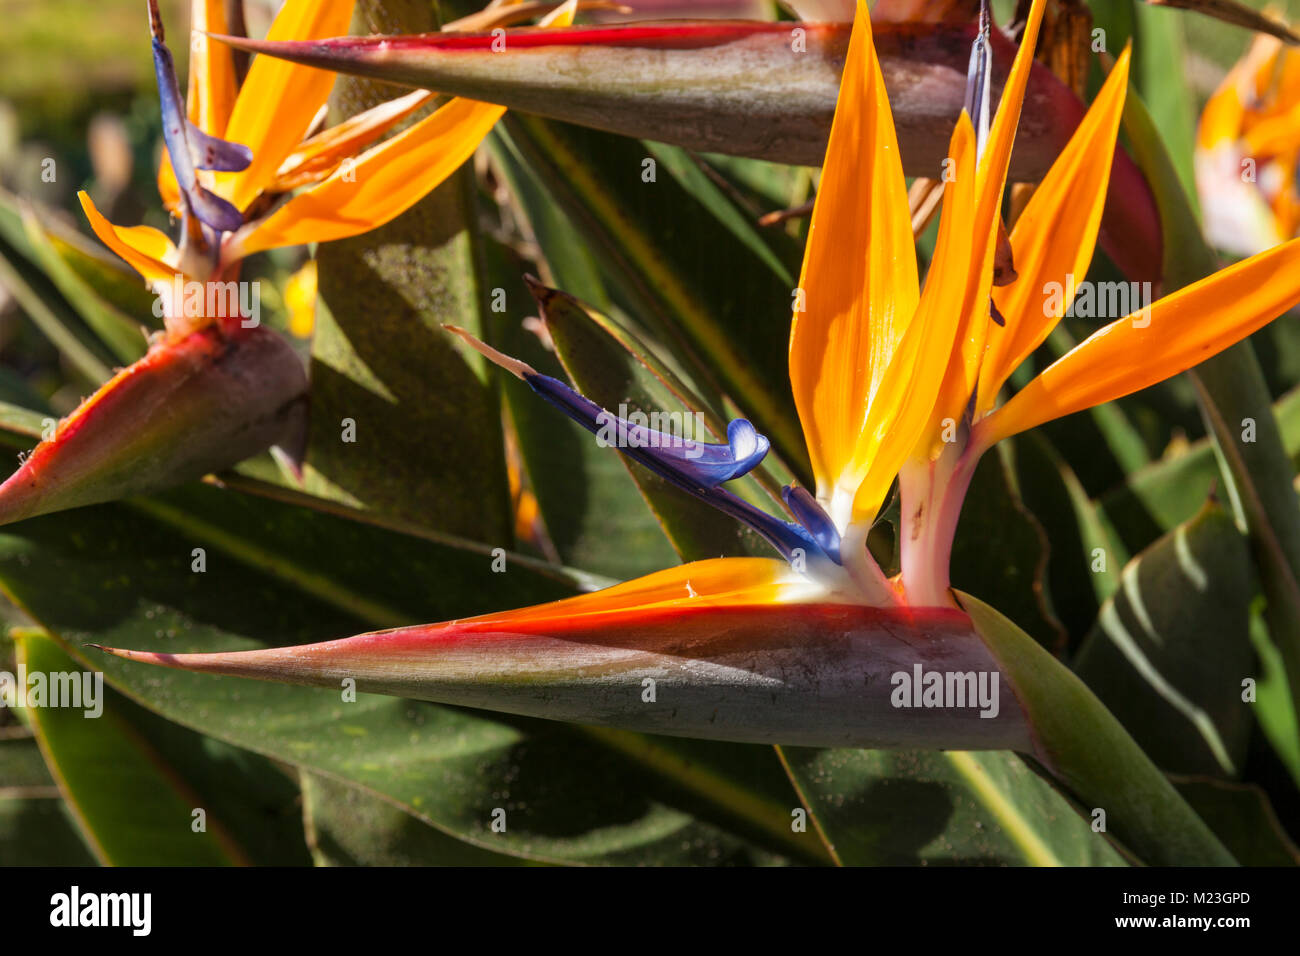 MADEIRA PORTOGALLO MADEIRA uccello del paradiso fiore Strelitzia reginae giardini botanici FUNCHAL Giardino Botanico Immagini Stock